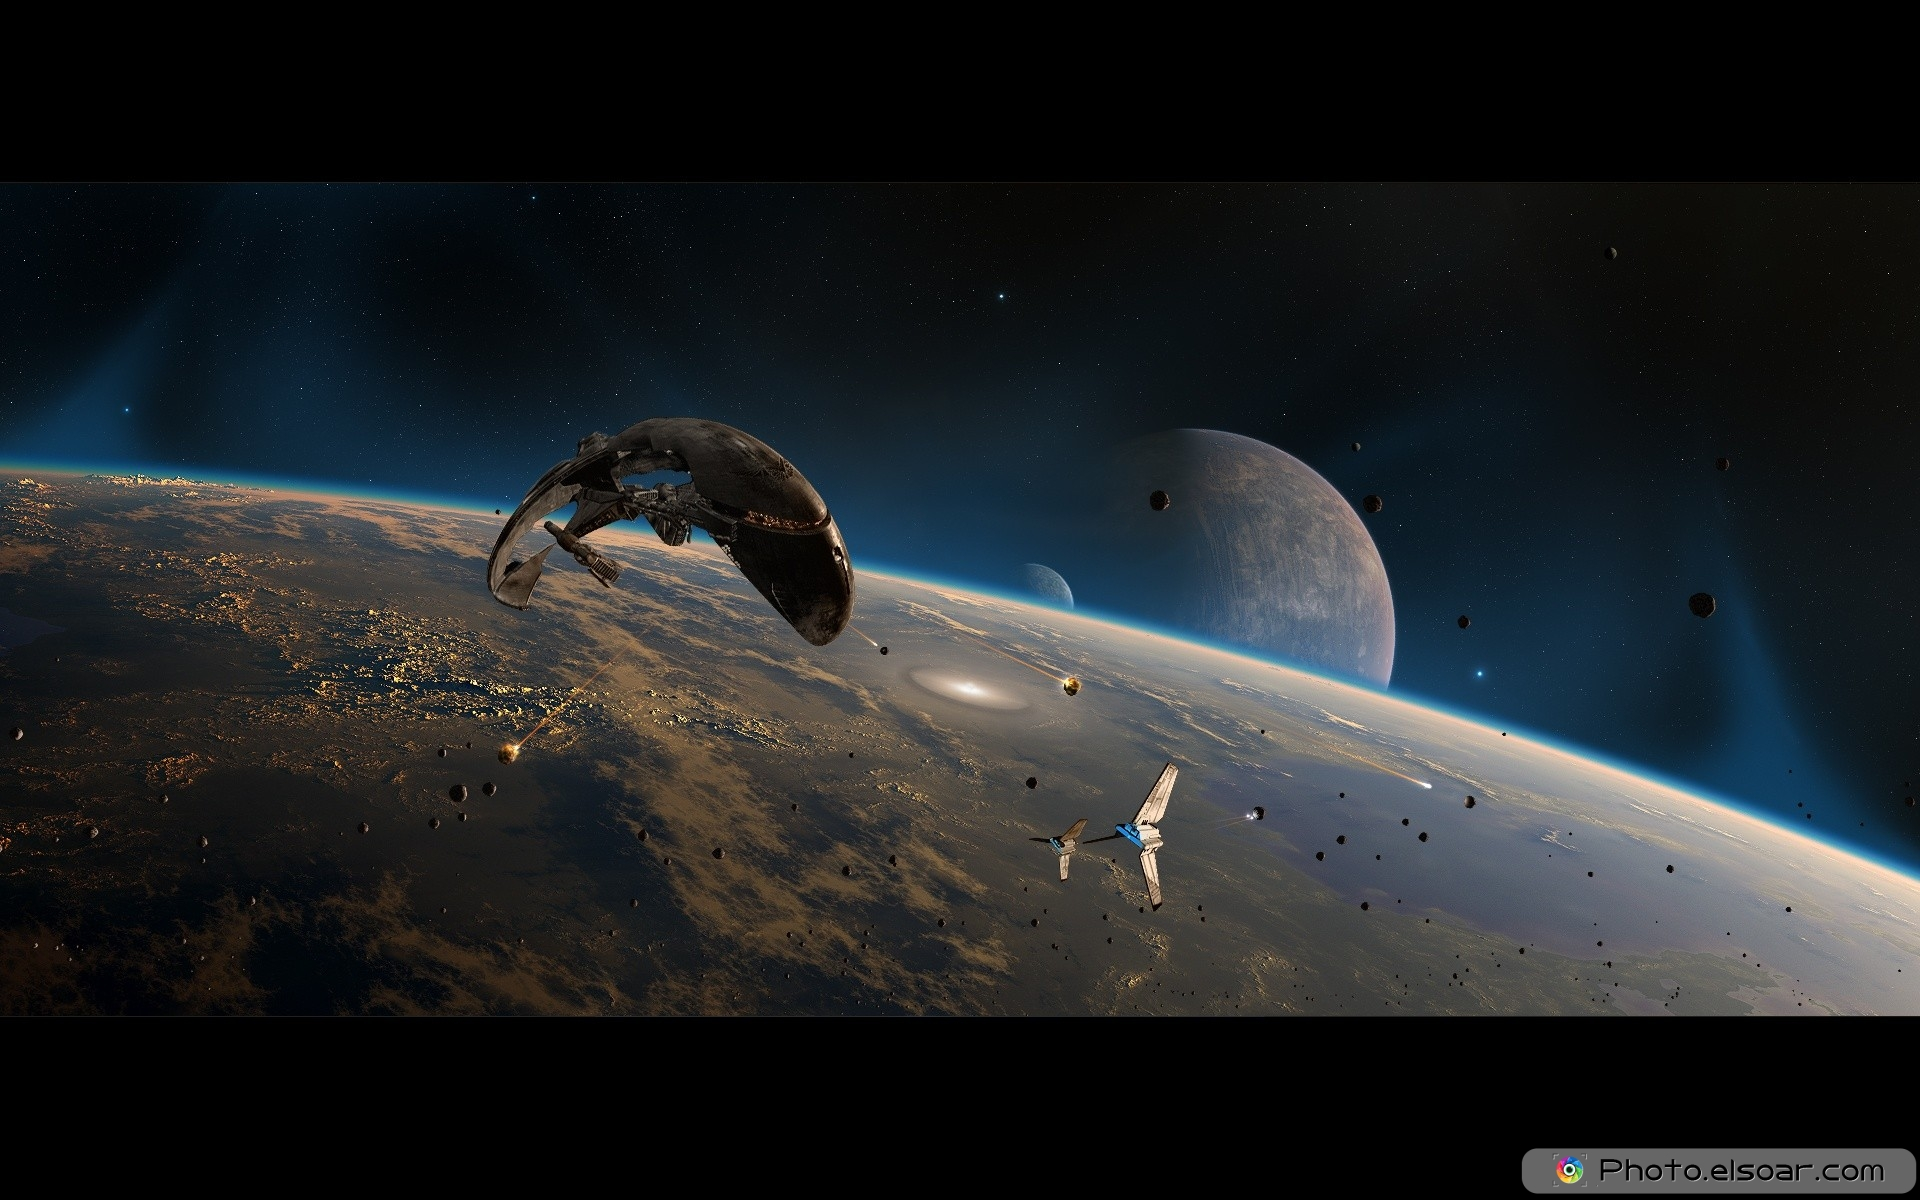 outer space free hd desktop wallpaper